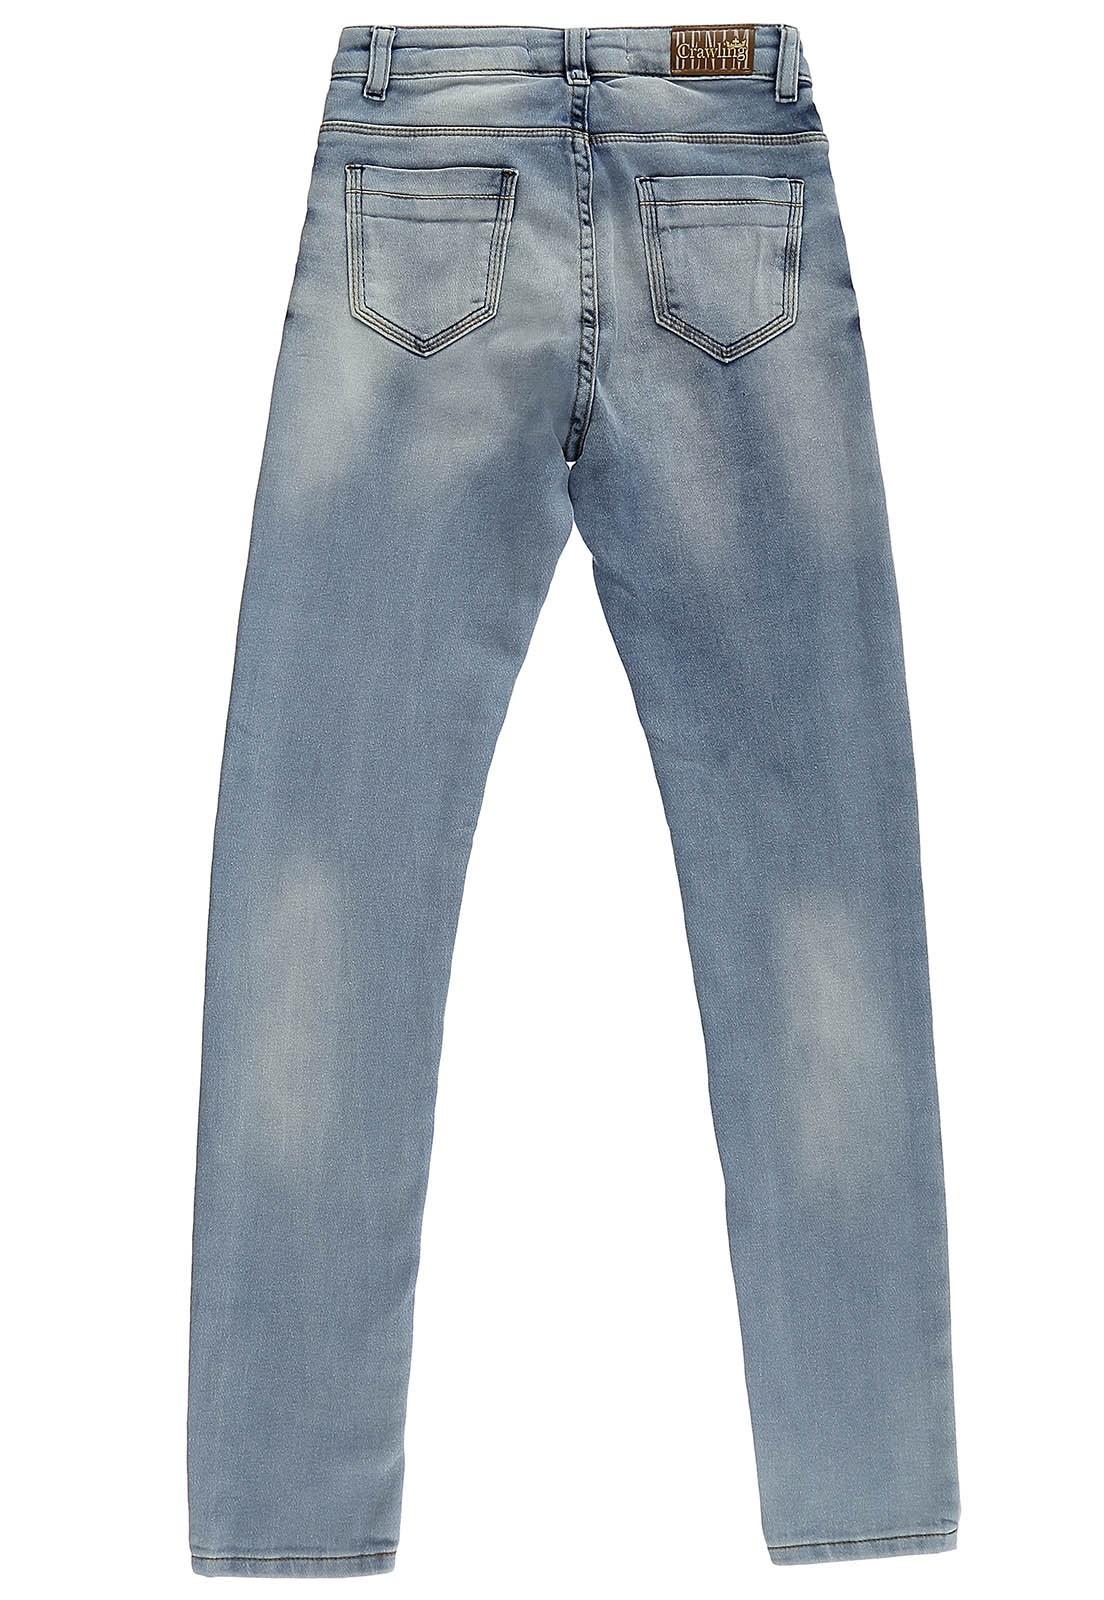 Calça Feminina Skinny Crawling Jeans